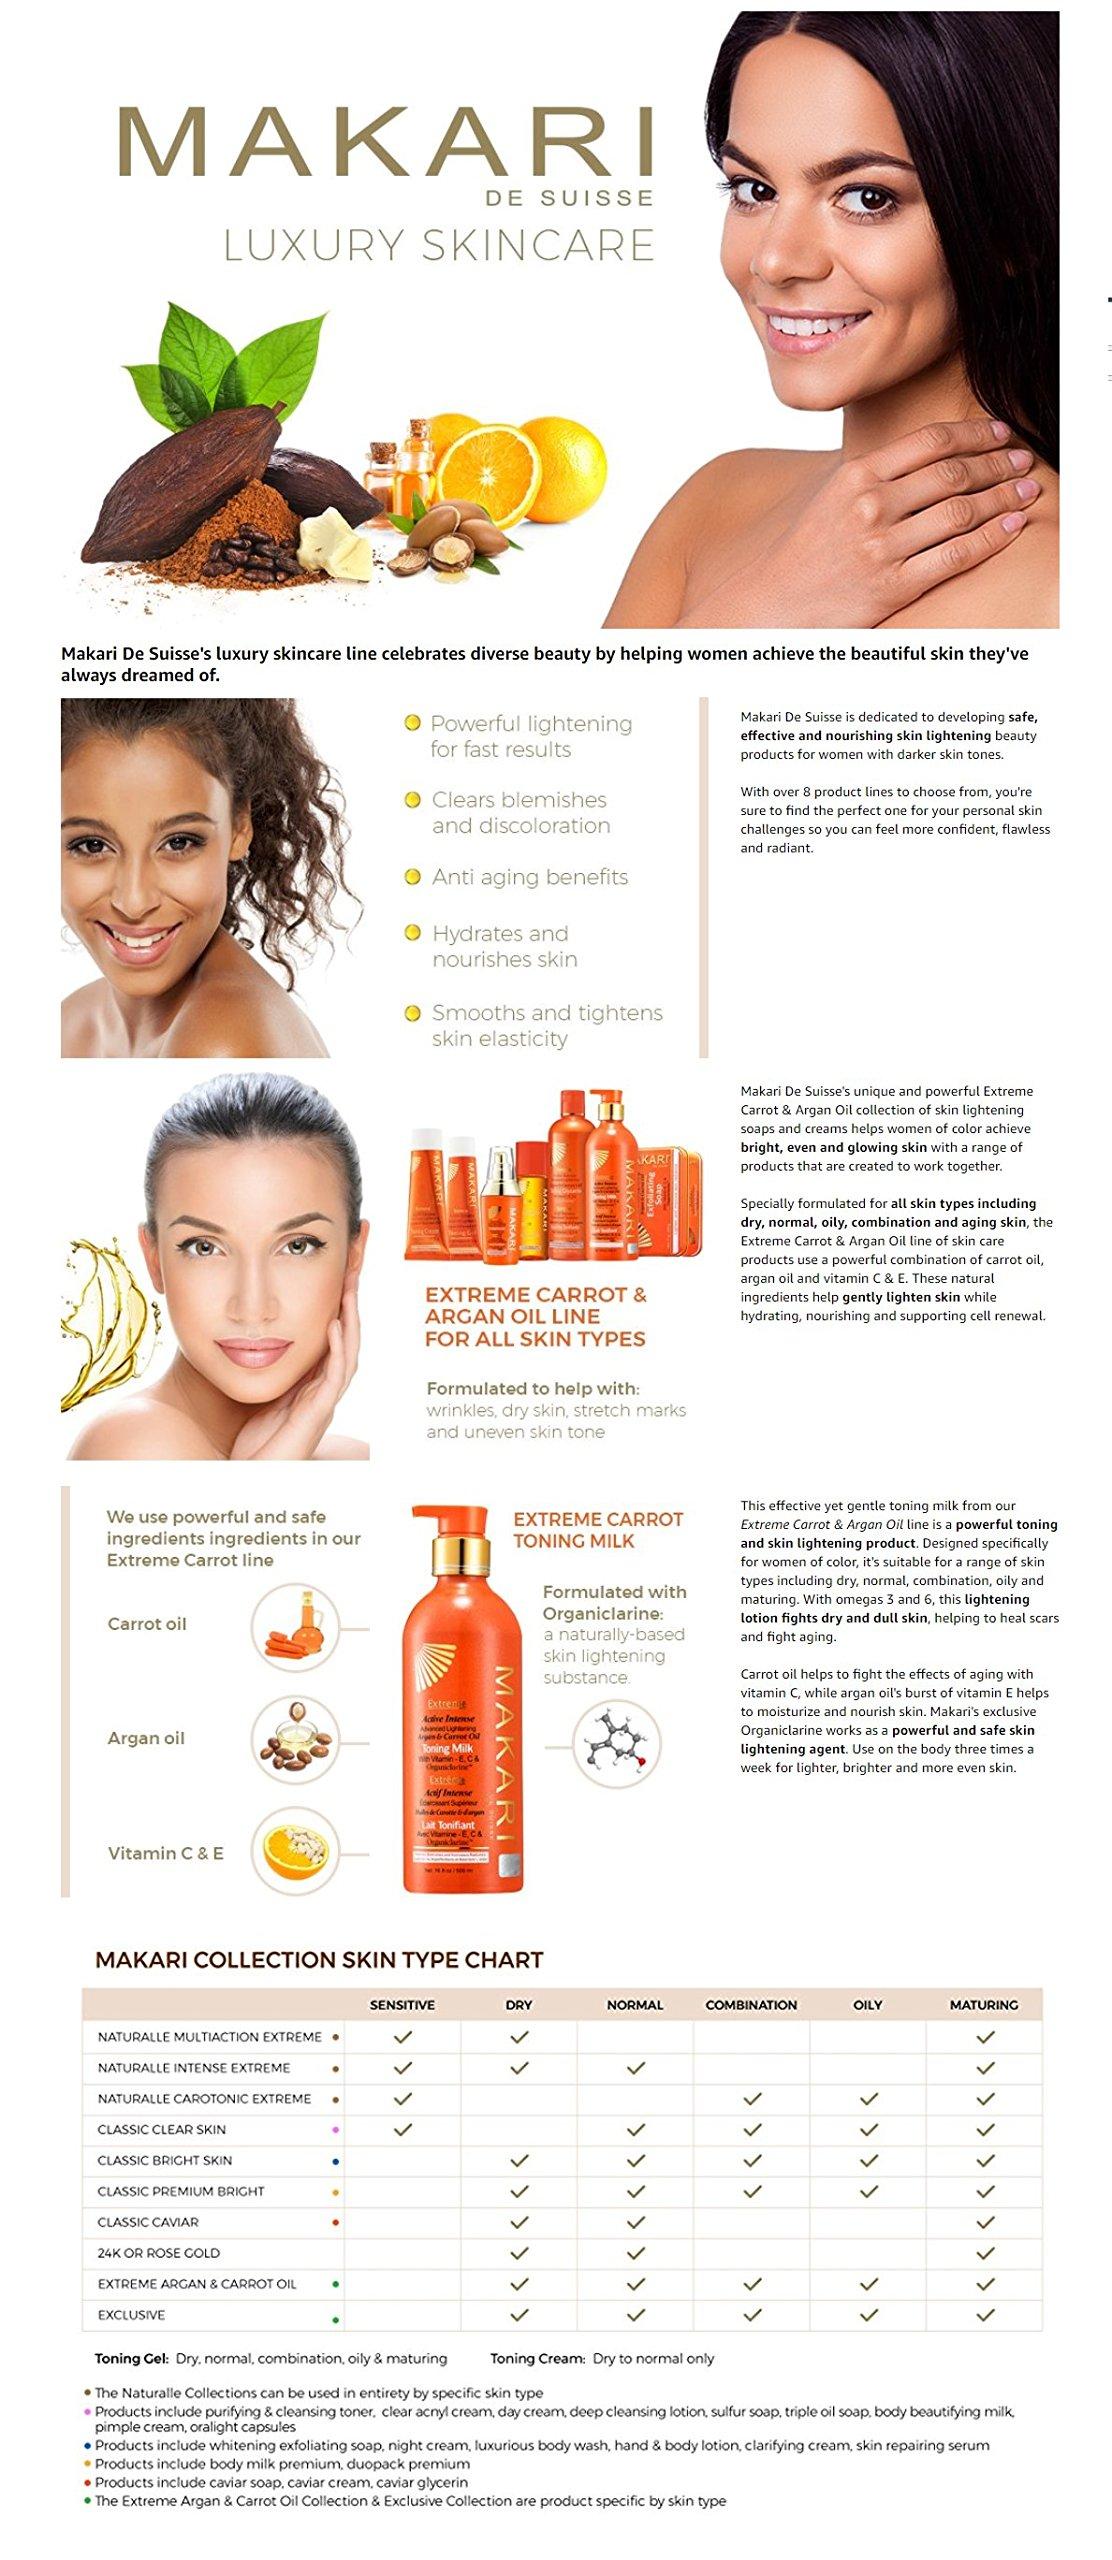 Makari Extreme Carrot & Argan Oil Skin Toning BODY MILK 16.8oz – Lightening 1